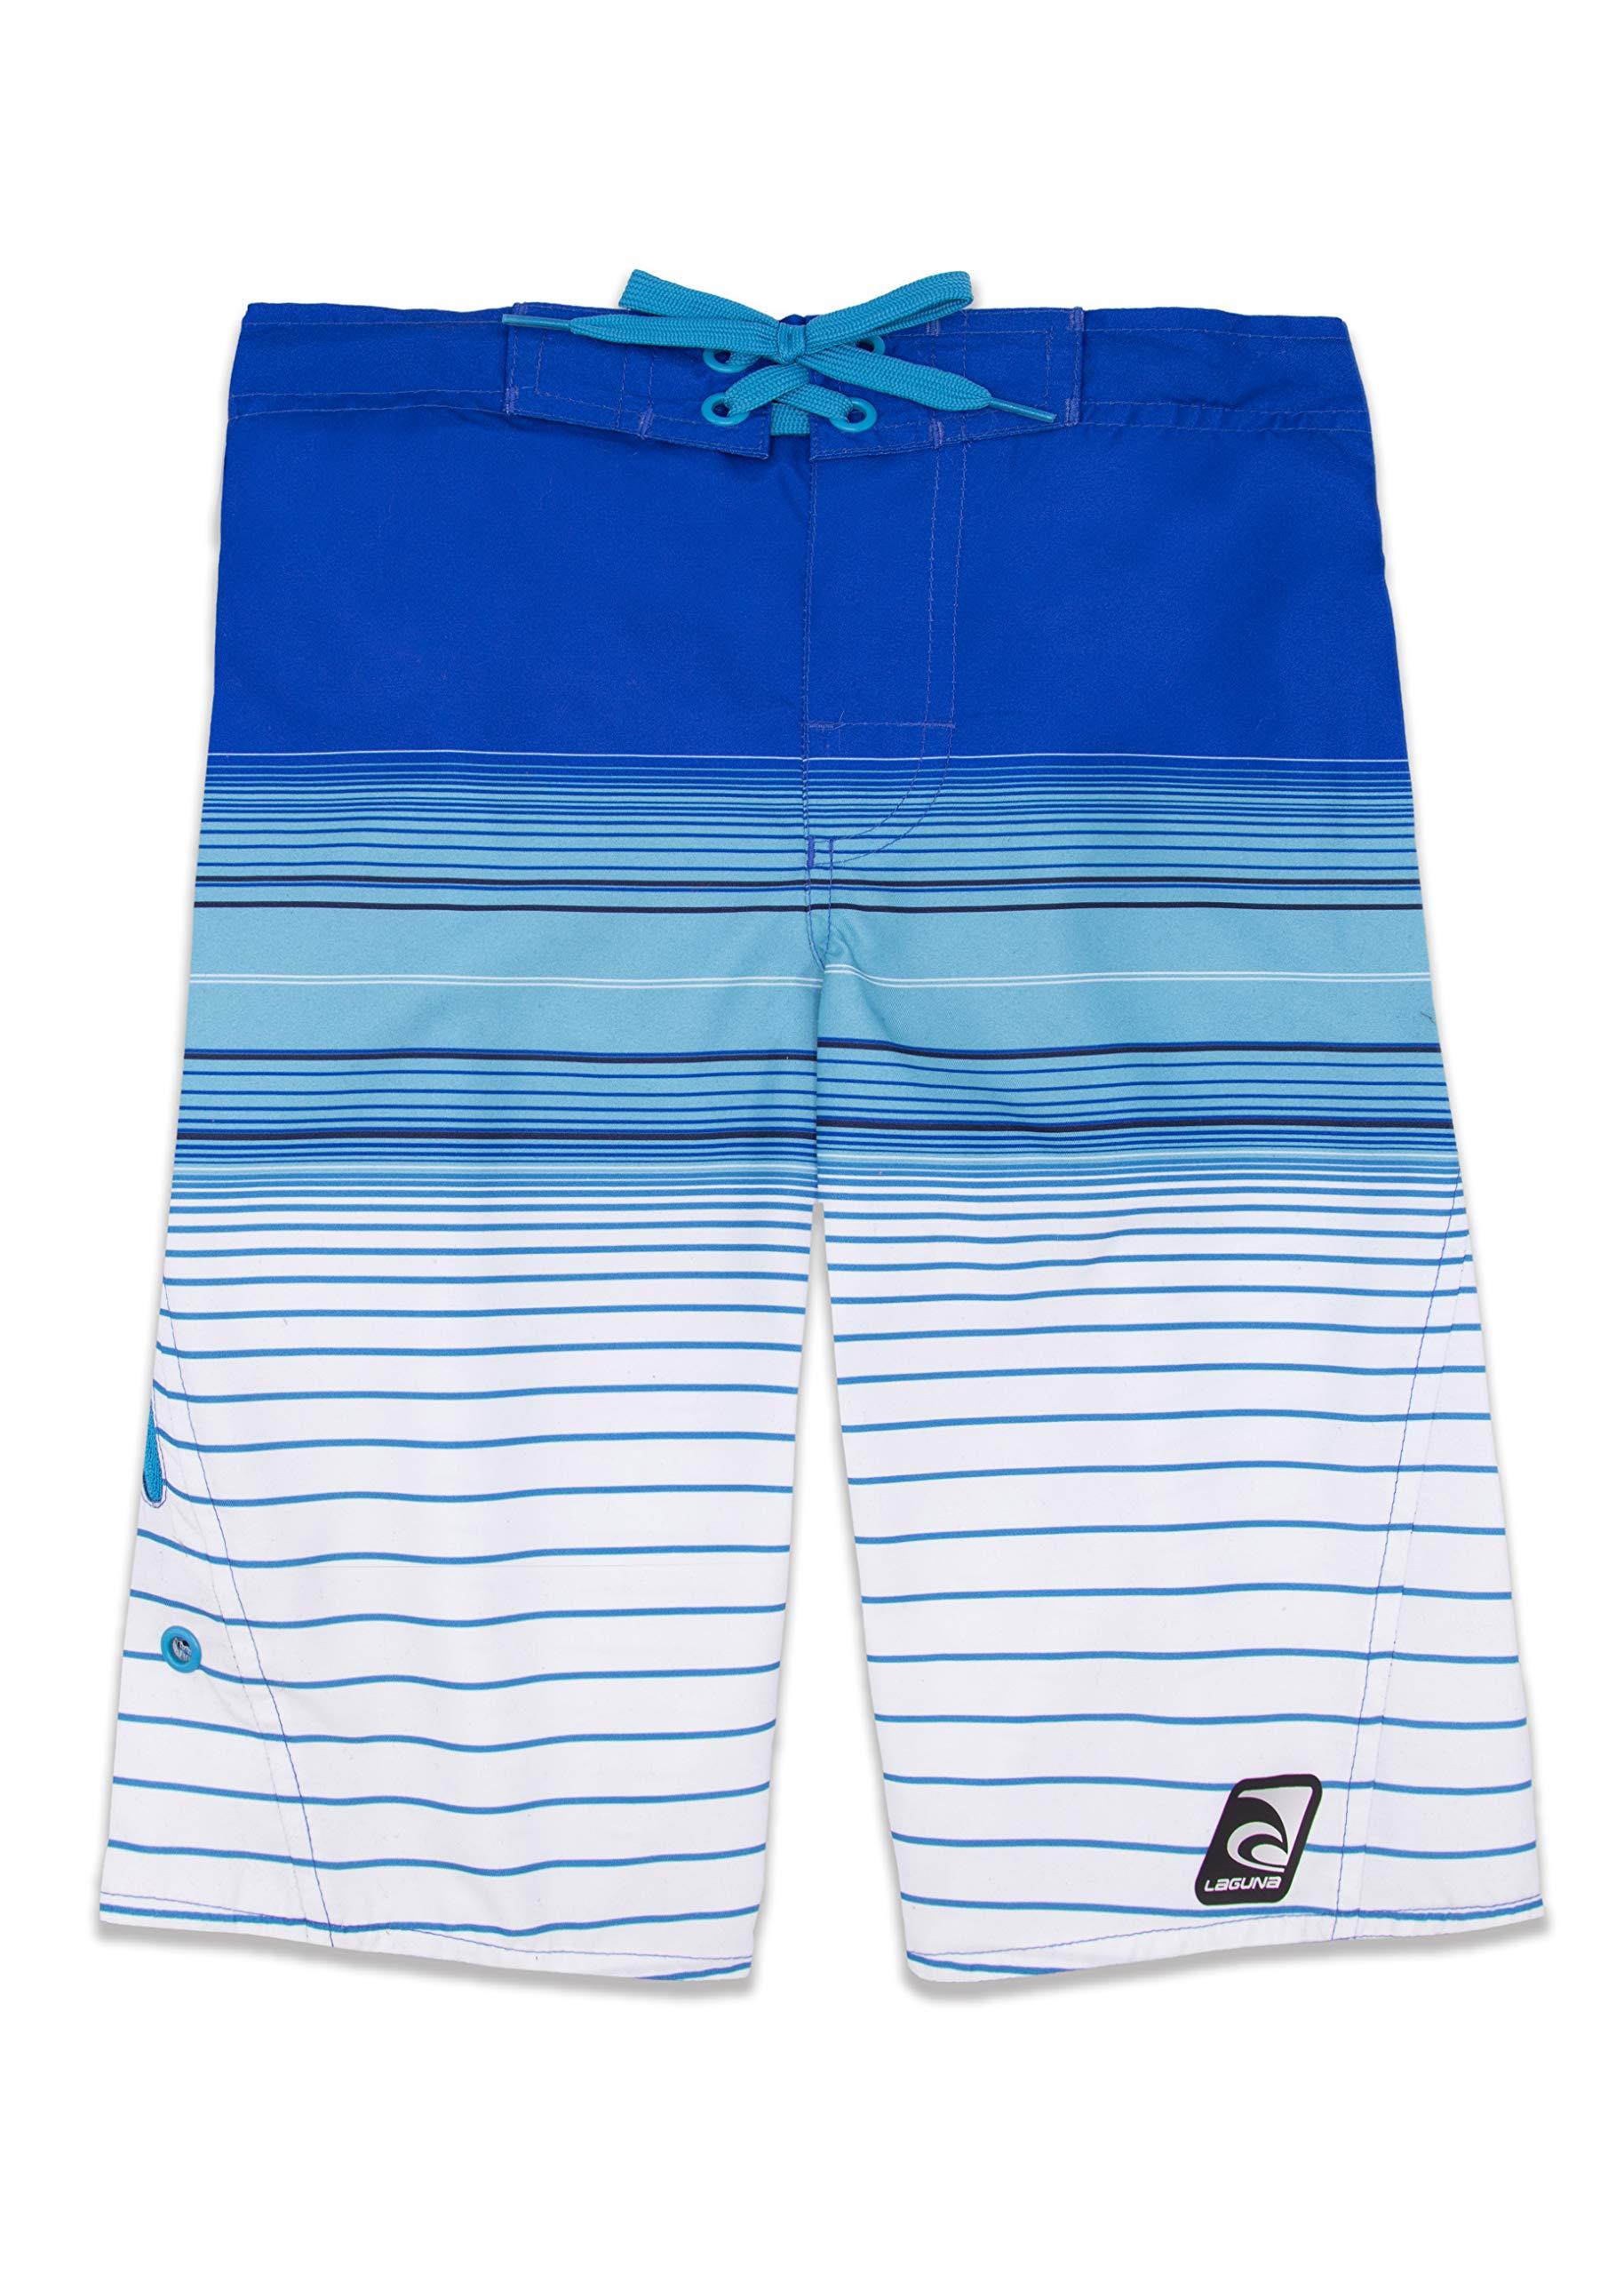 LAGUNA Boys Summer Stripe Boardshorts Swim Trunks, UPF 50+, Blue/White, 10/12